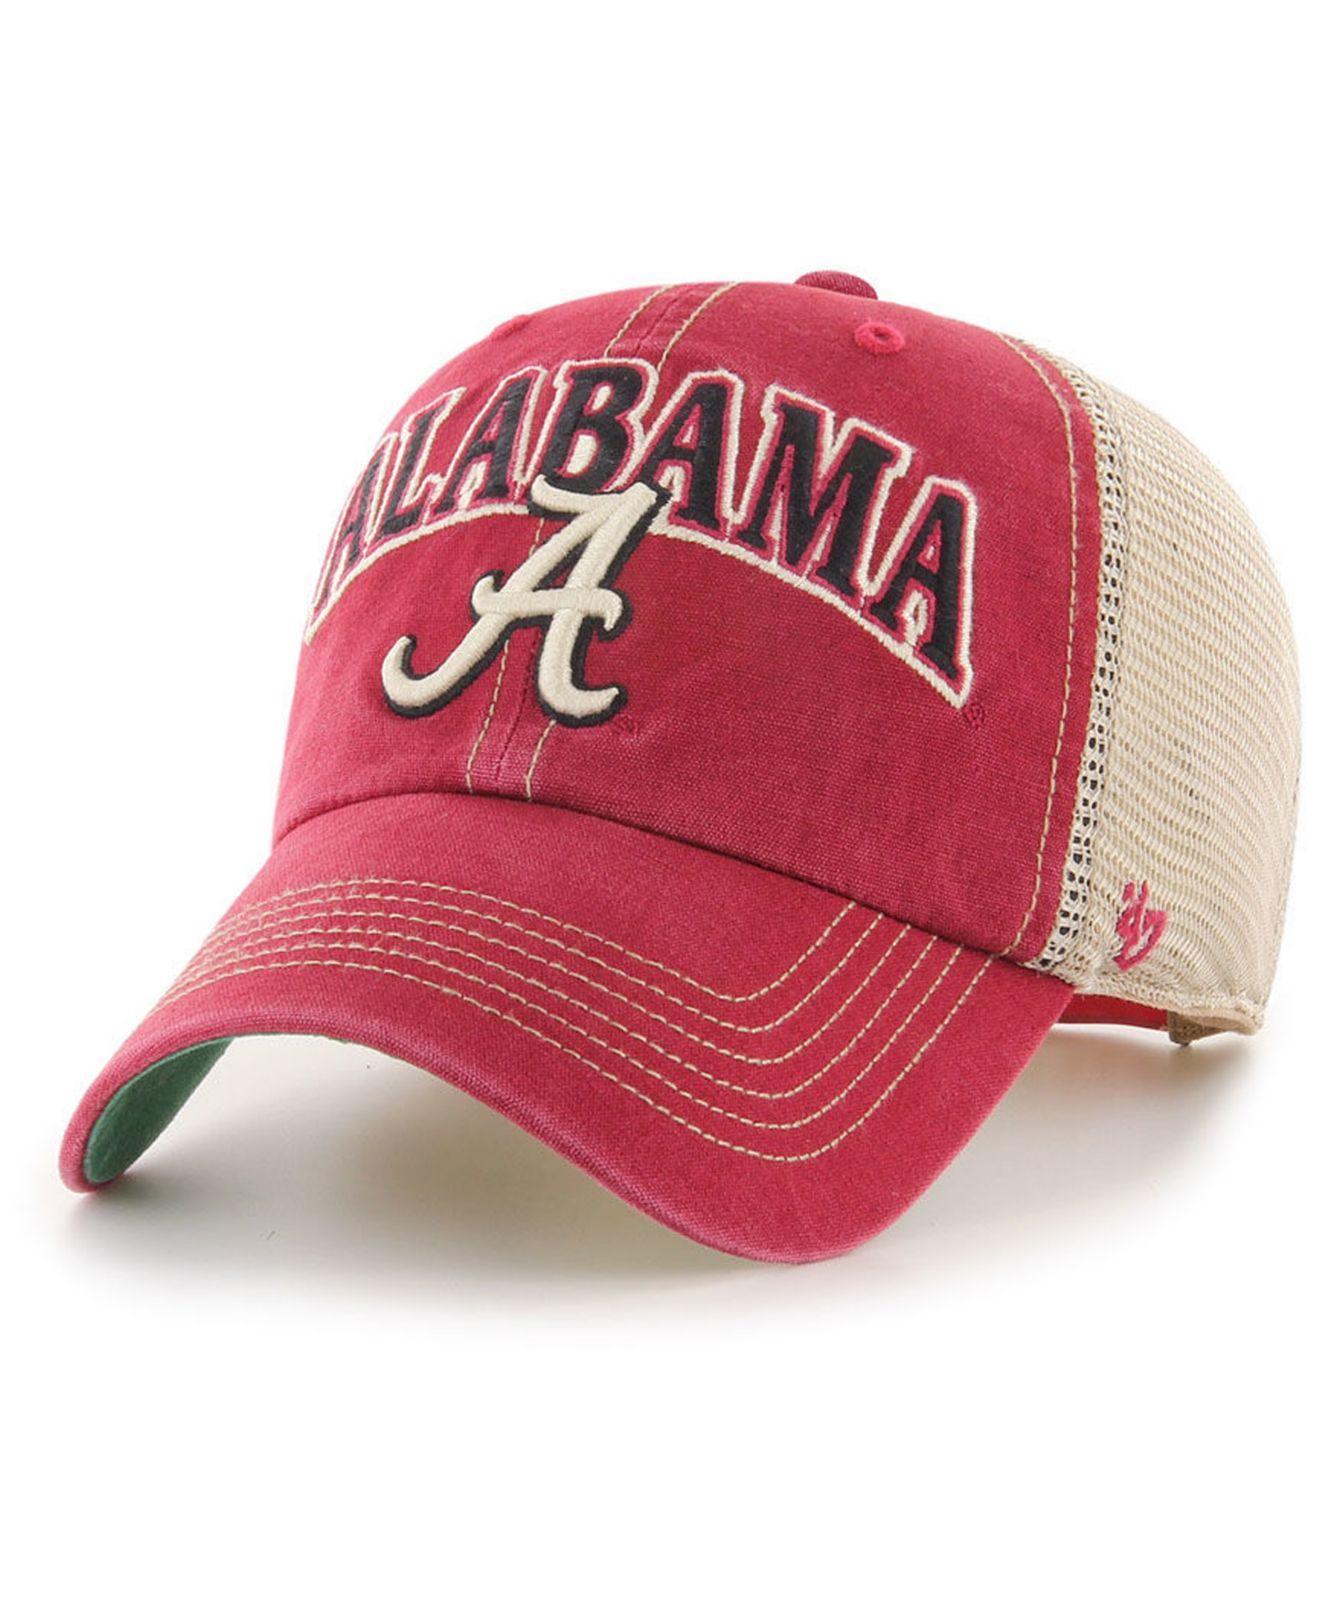 sale retailer b1f07 8a160 47 Brand. Men s Alabama Crimson Tide Tuscaloosa Mesh Clean Up Cap